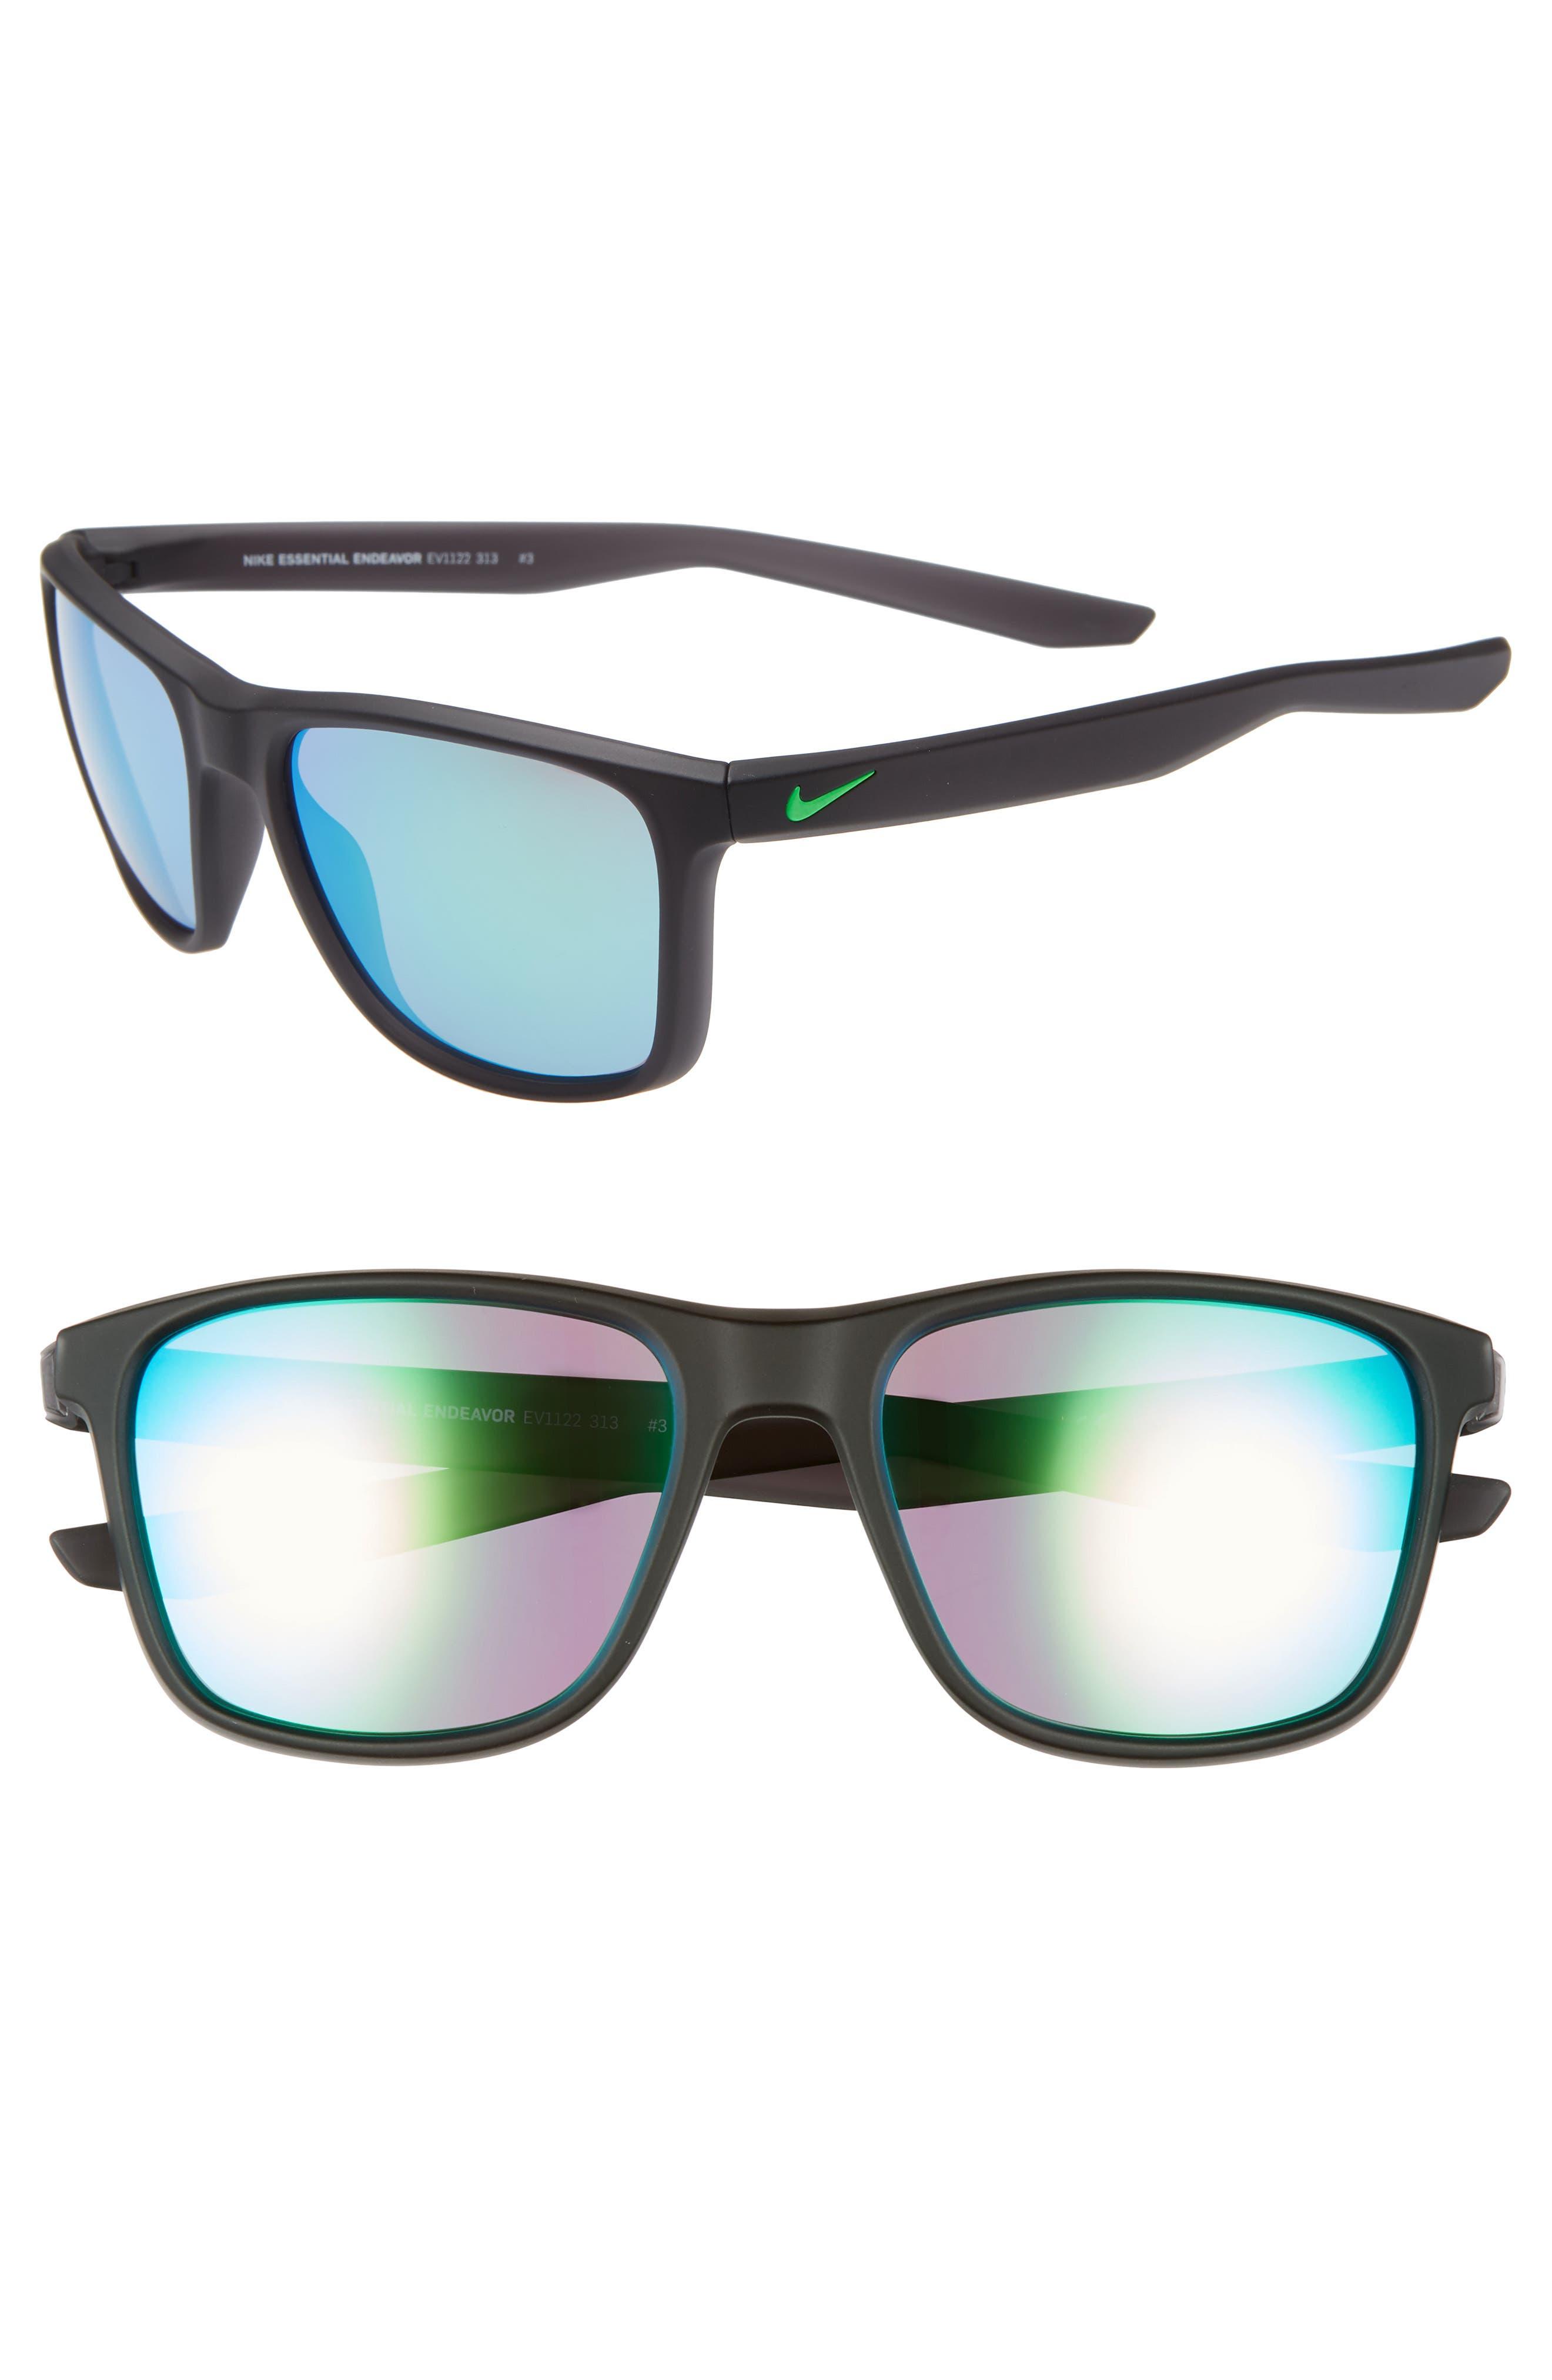 Nike Essential Endeavor 57Mm Square Sunglasses - Grey/ Dark Teal